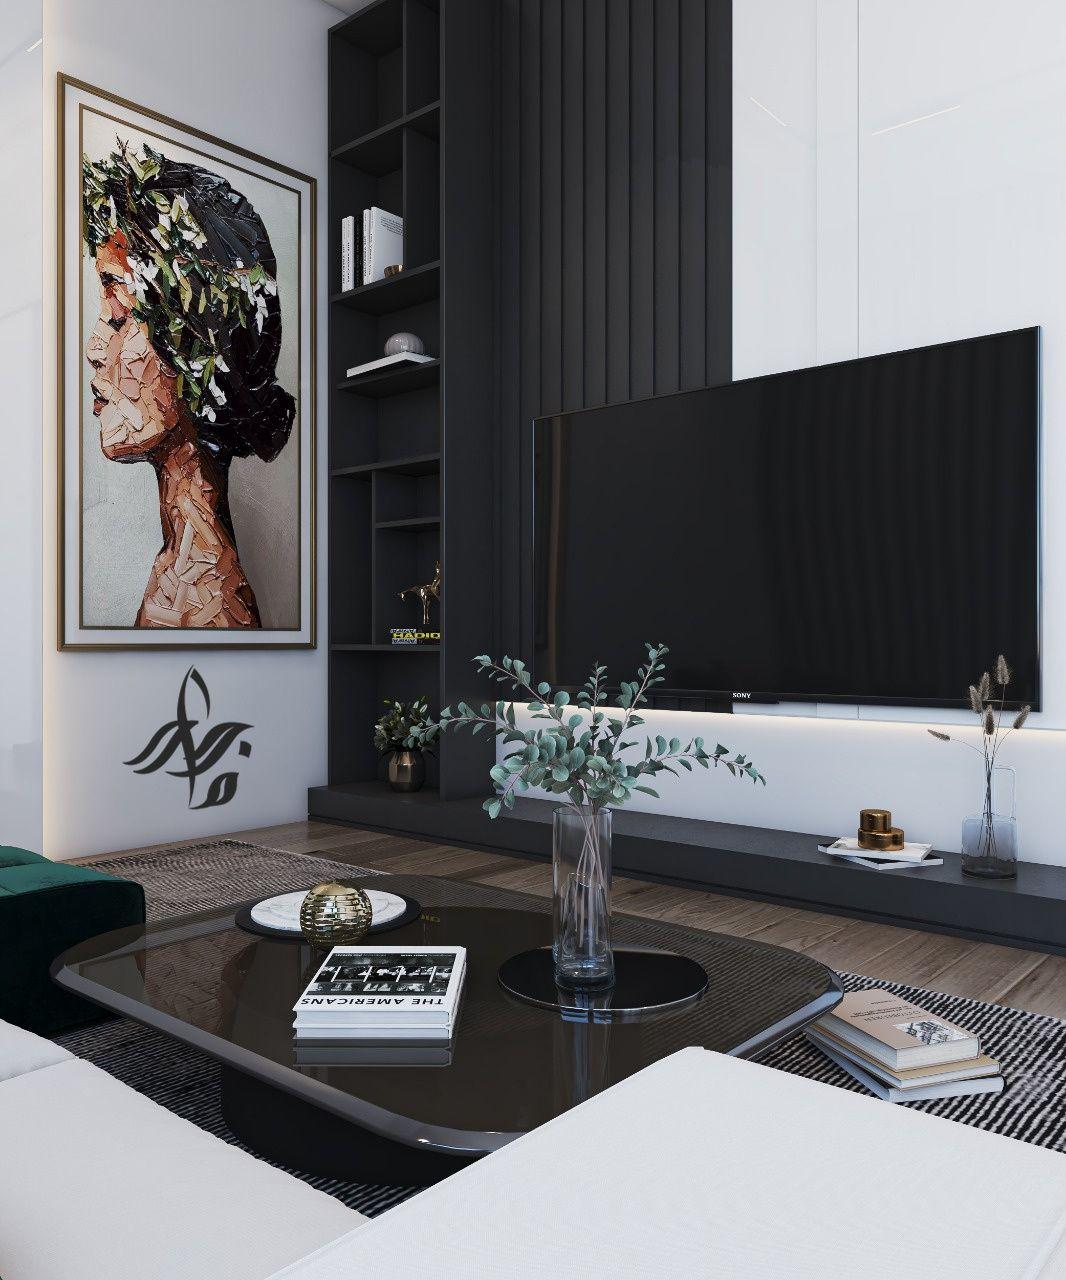 صالة جلوس مودرن In 2021 Decor Home Decor Bathroom Mirror